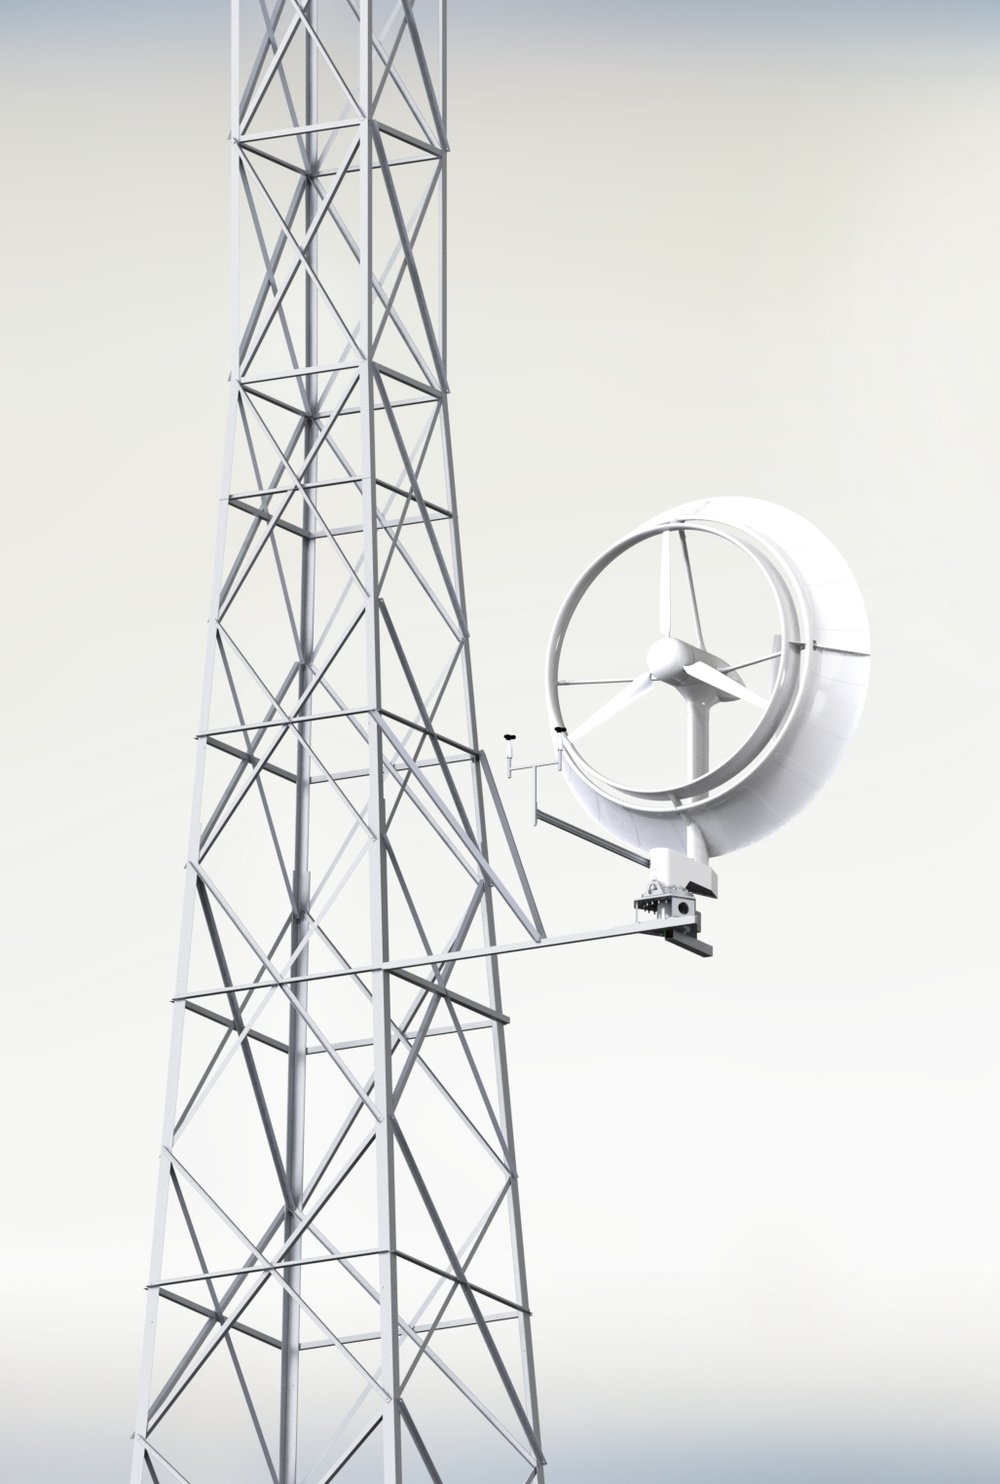 VL-009-Tower.JPG